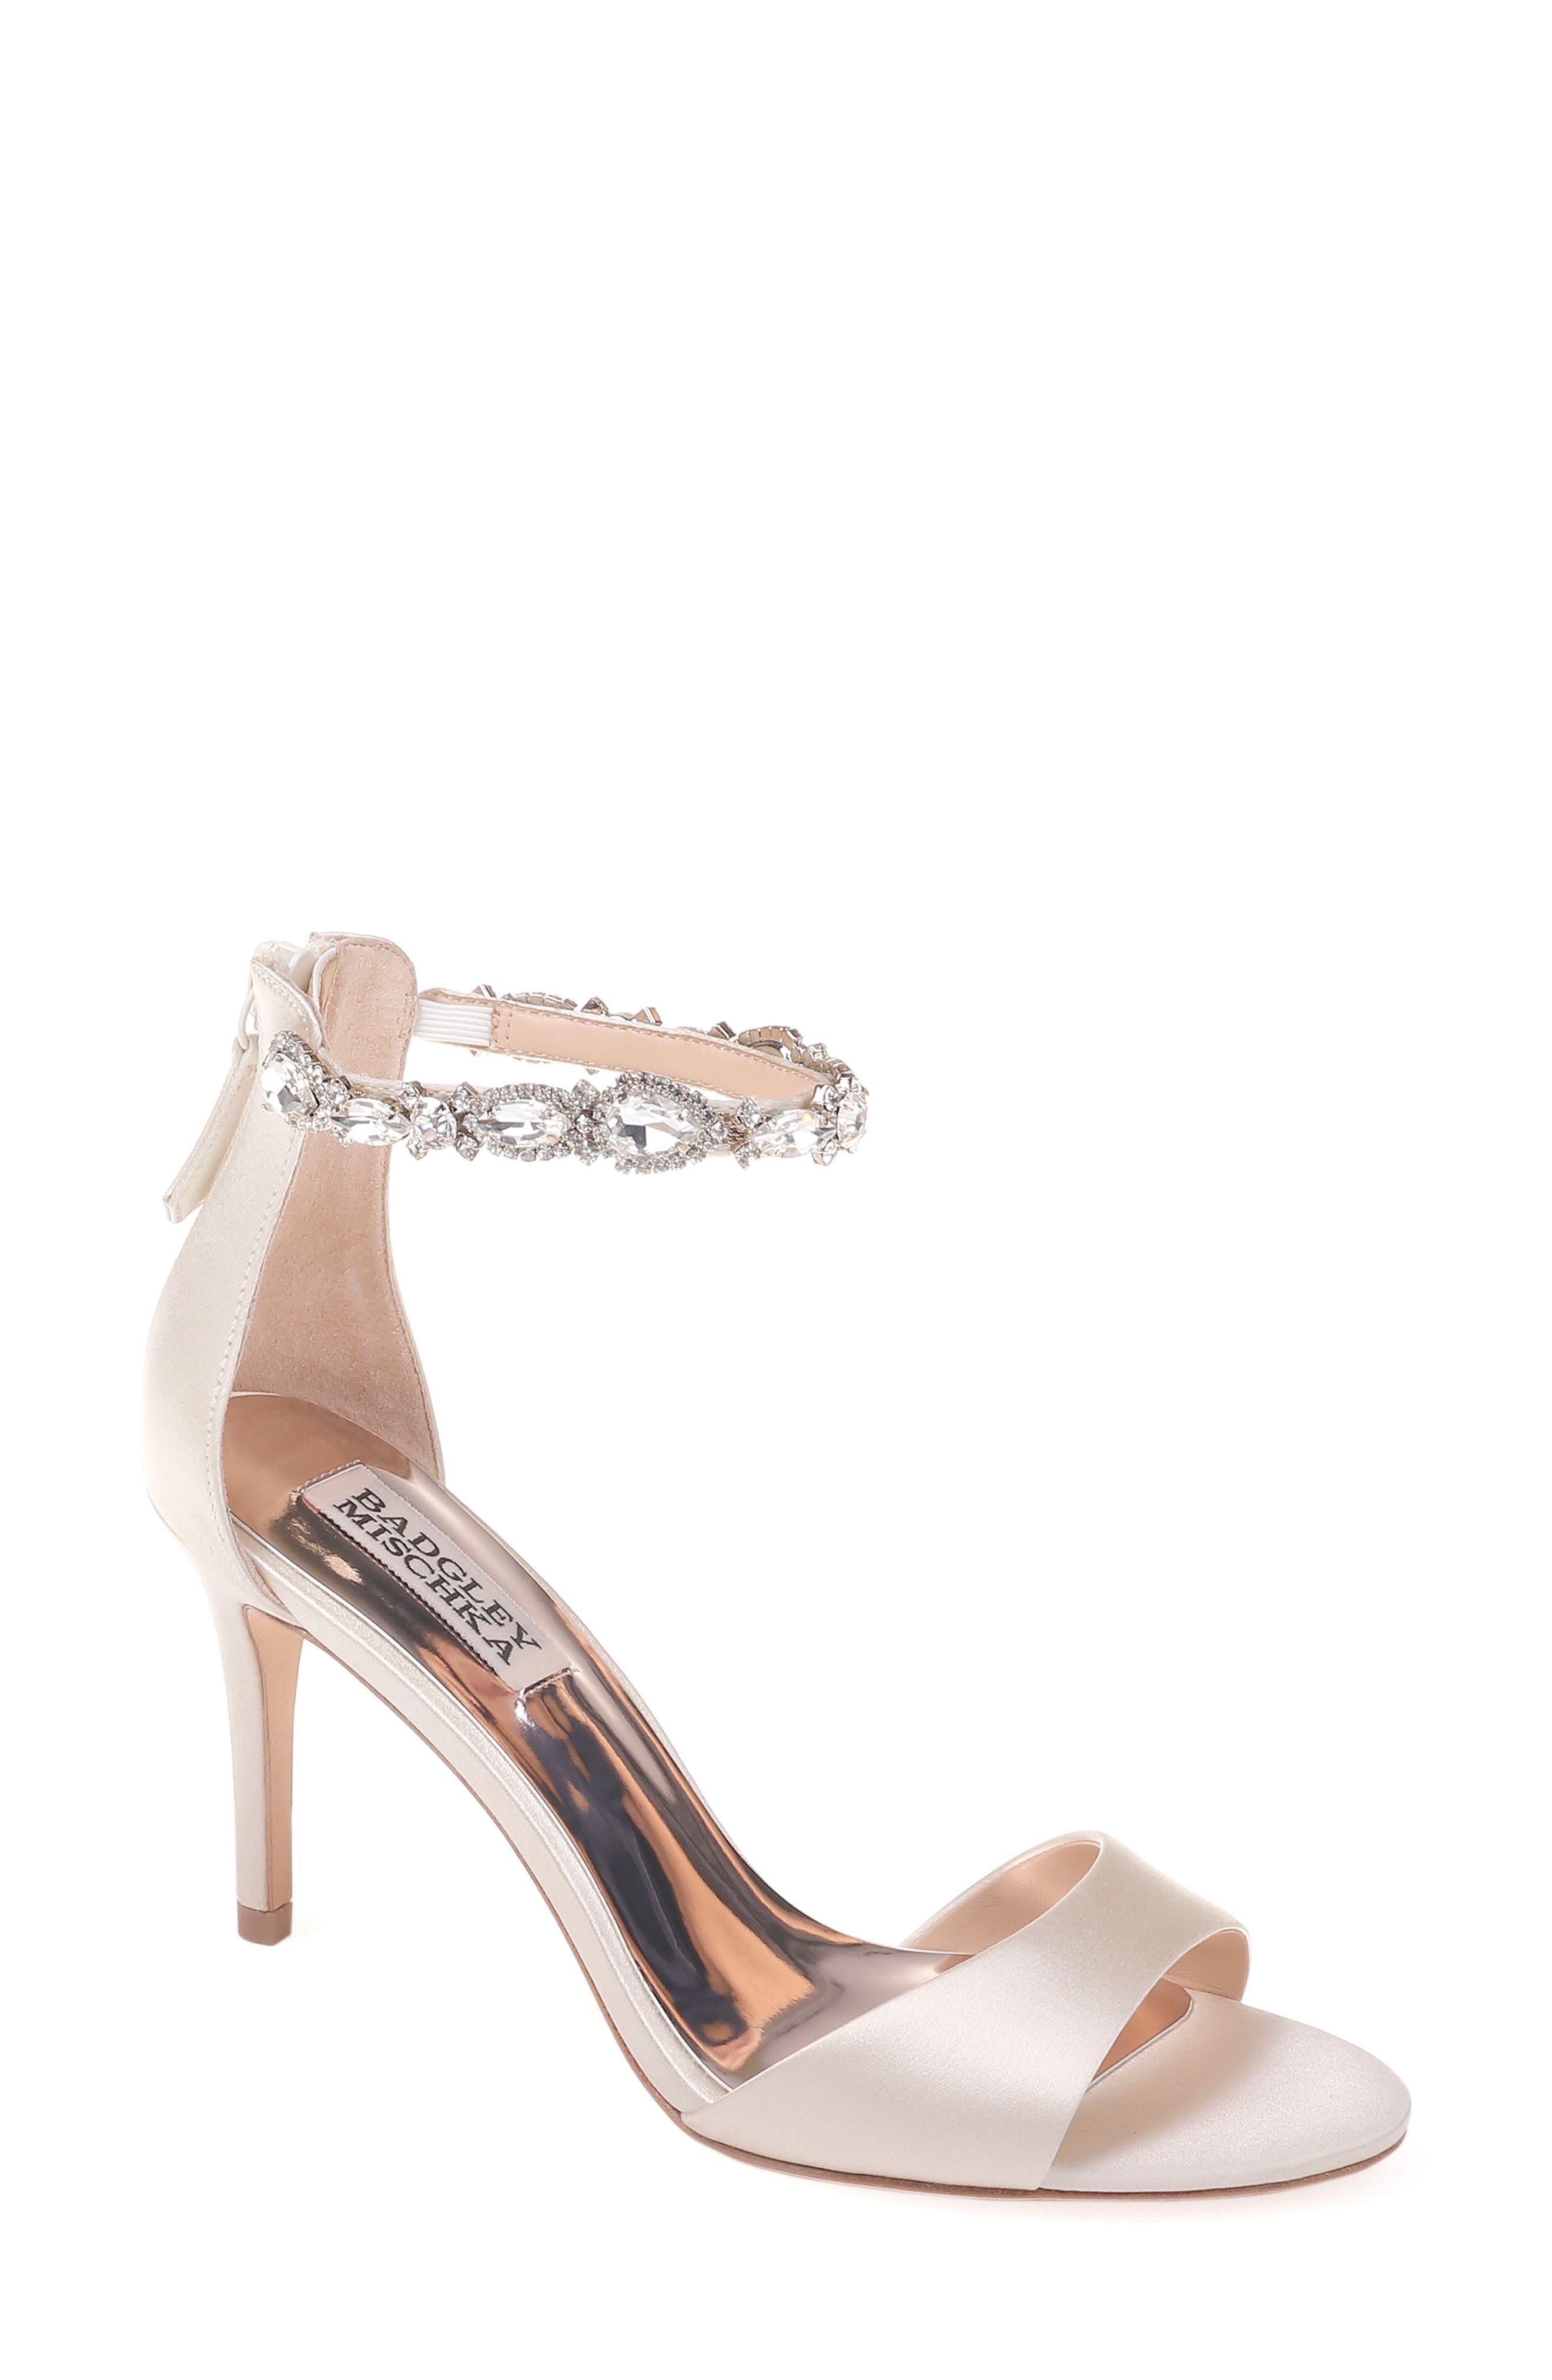 Sindy Ankle Strap Sandal,                         Main,                         color, Ivory Satin